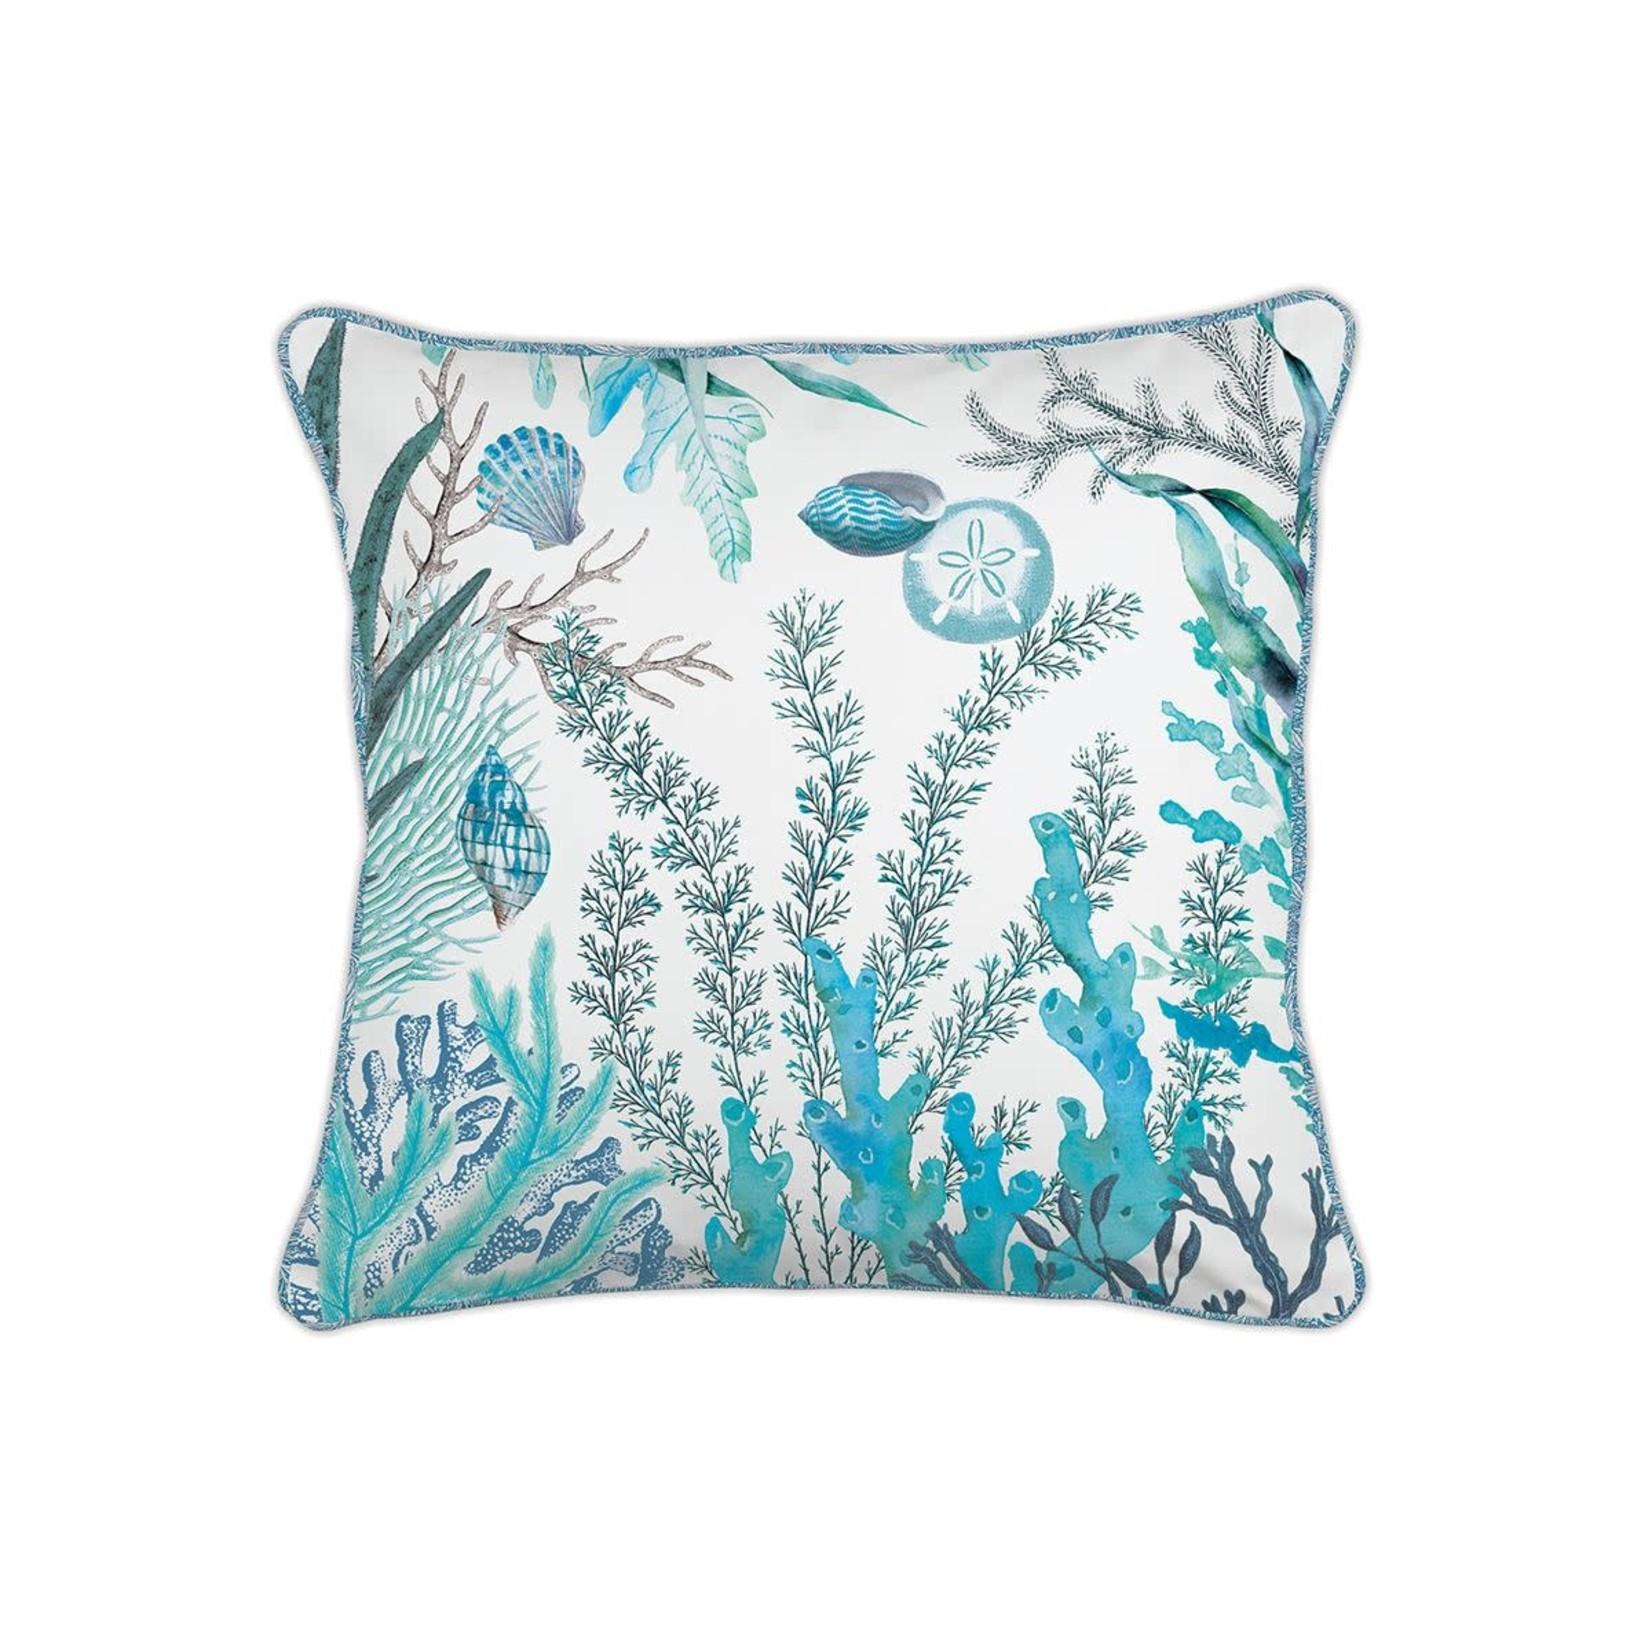 Michel Design Works Ocean Tide Square Pillow